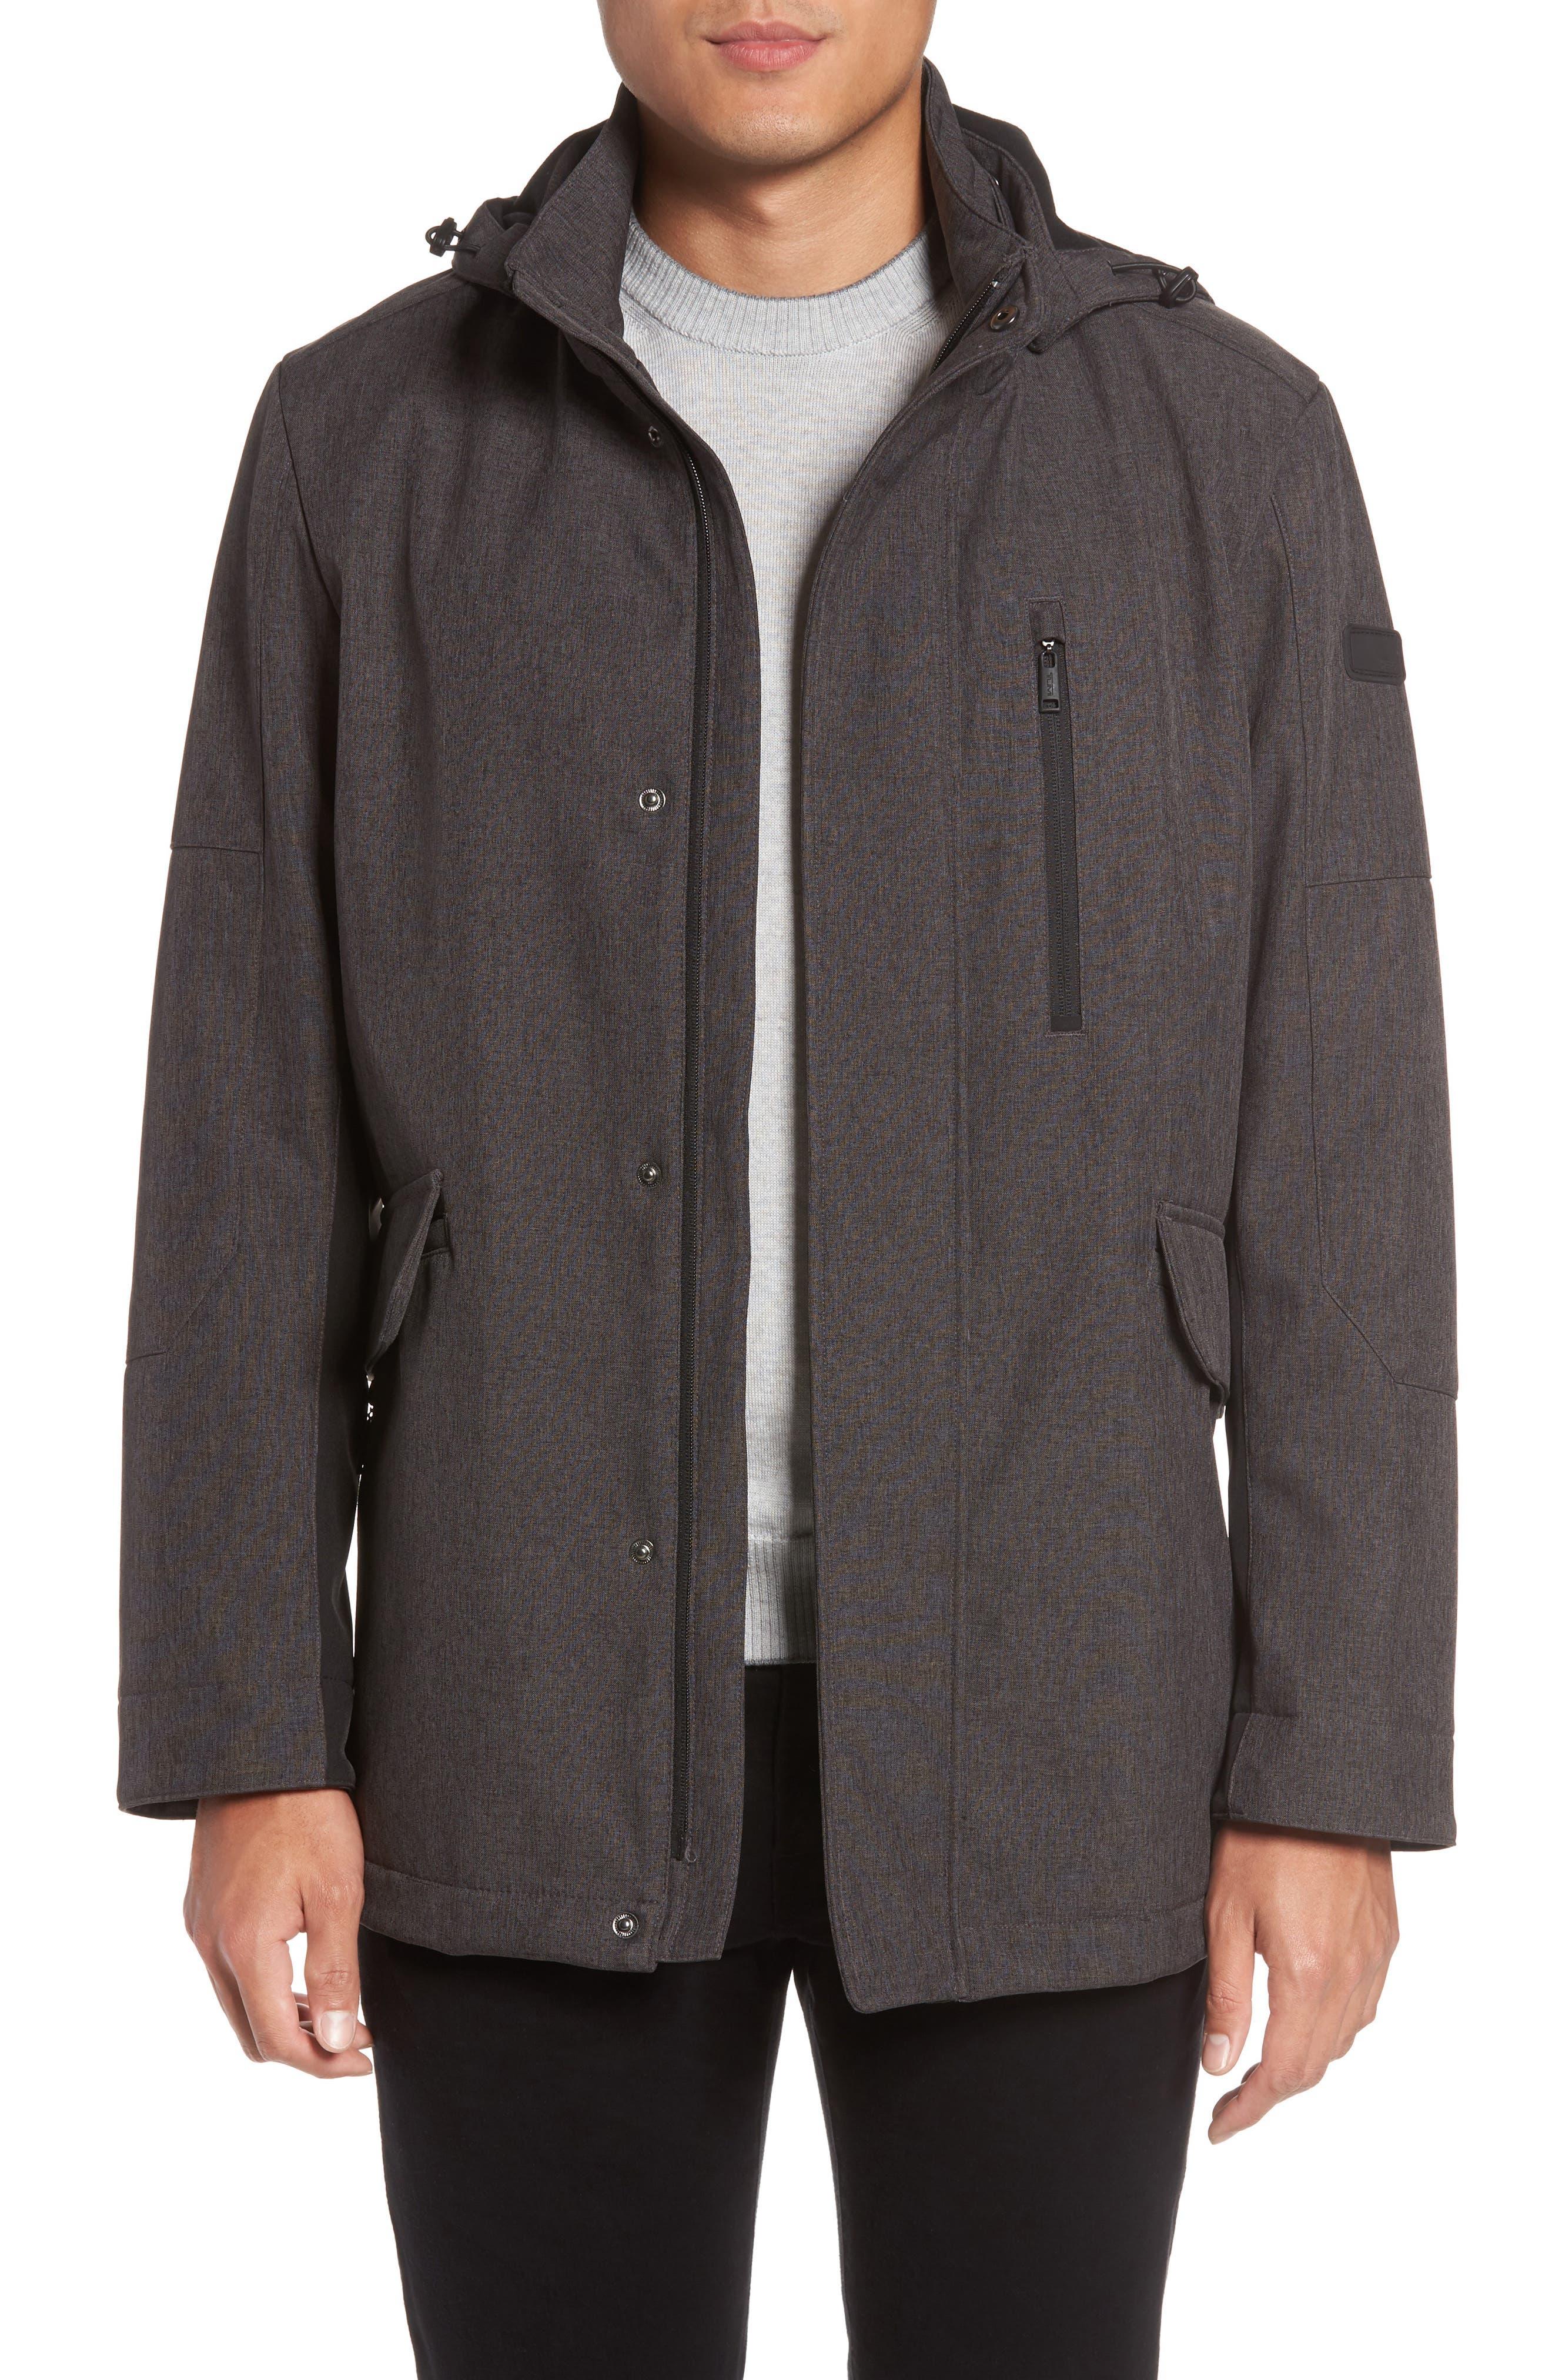 Understated Commuter Water-Resistant Jacket with Removable Hood,                         Main,                         color, Melange Grey